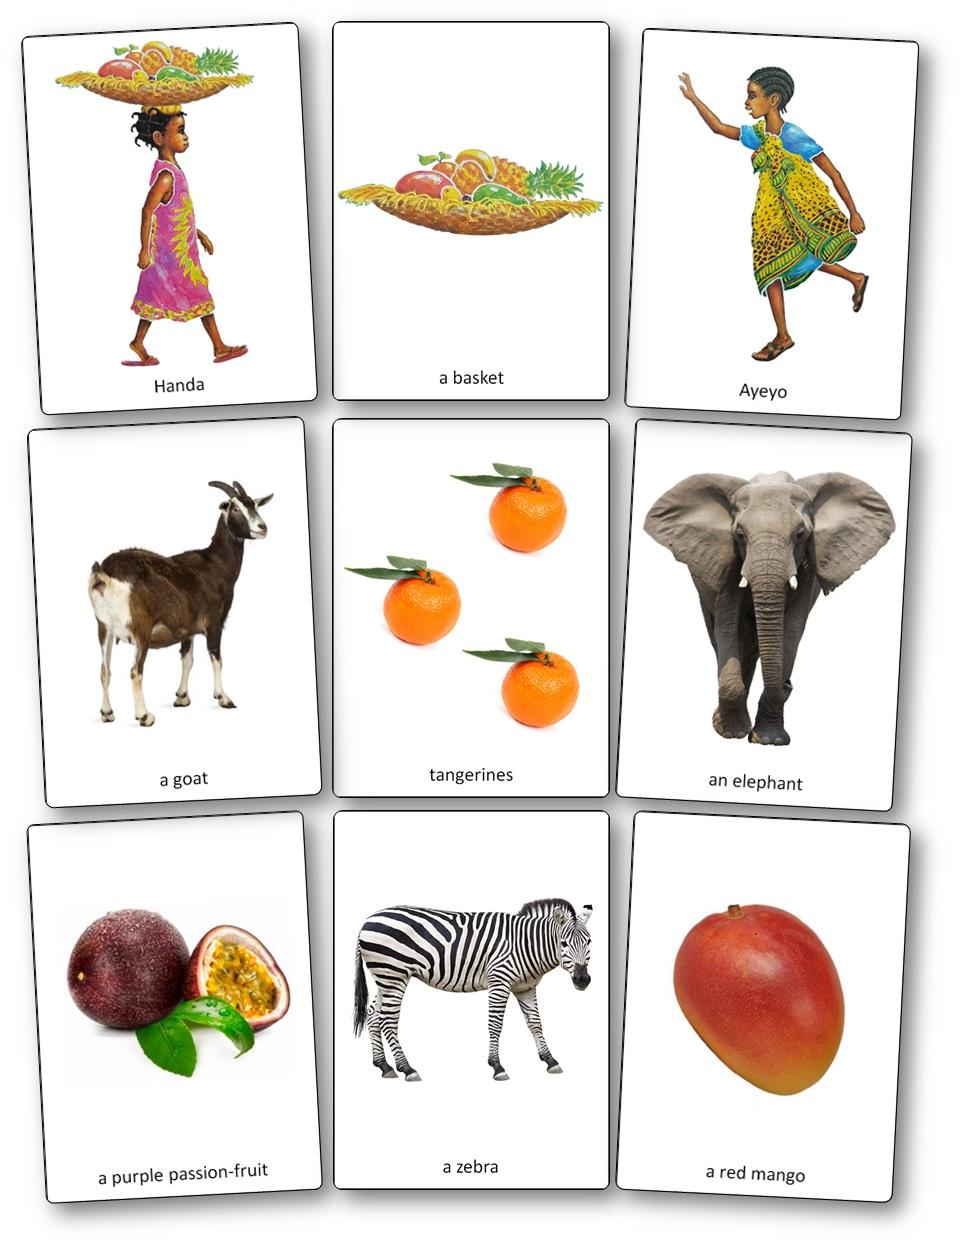 Handa's Surprise Picture Cards images, Handa's Surprise Printable